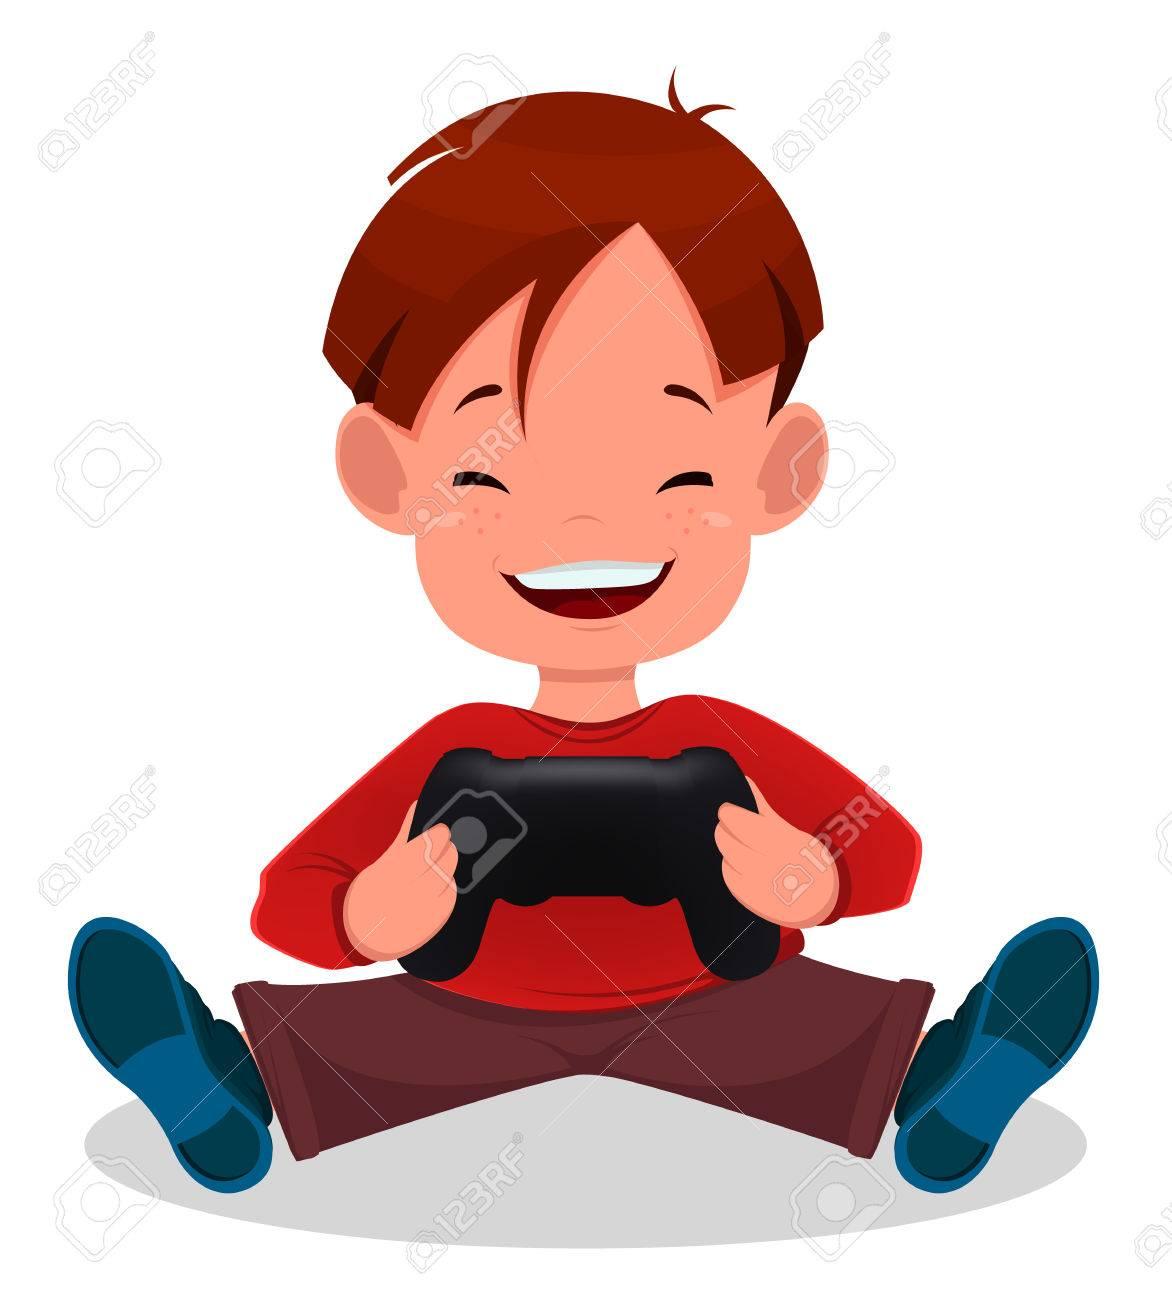 Alegre Niño Jugando Videojuegos Niño De Dibujos Animados Lindo